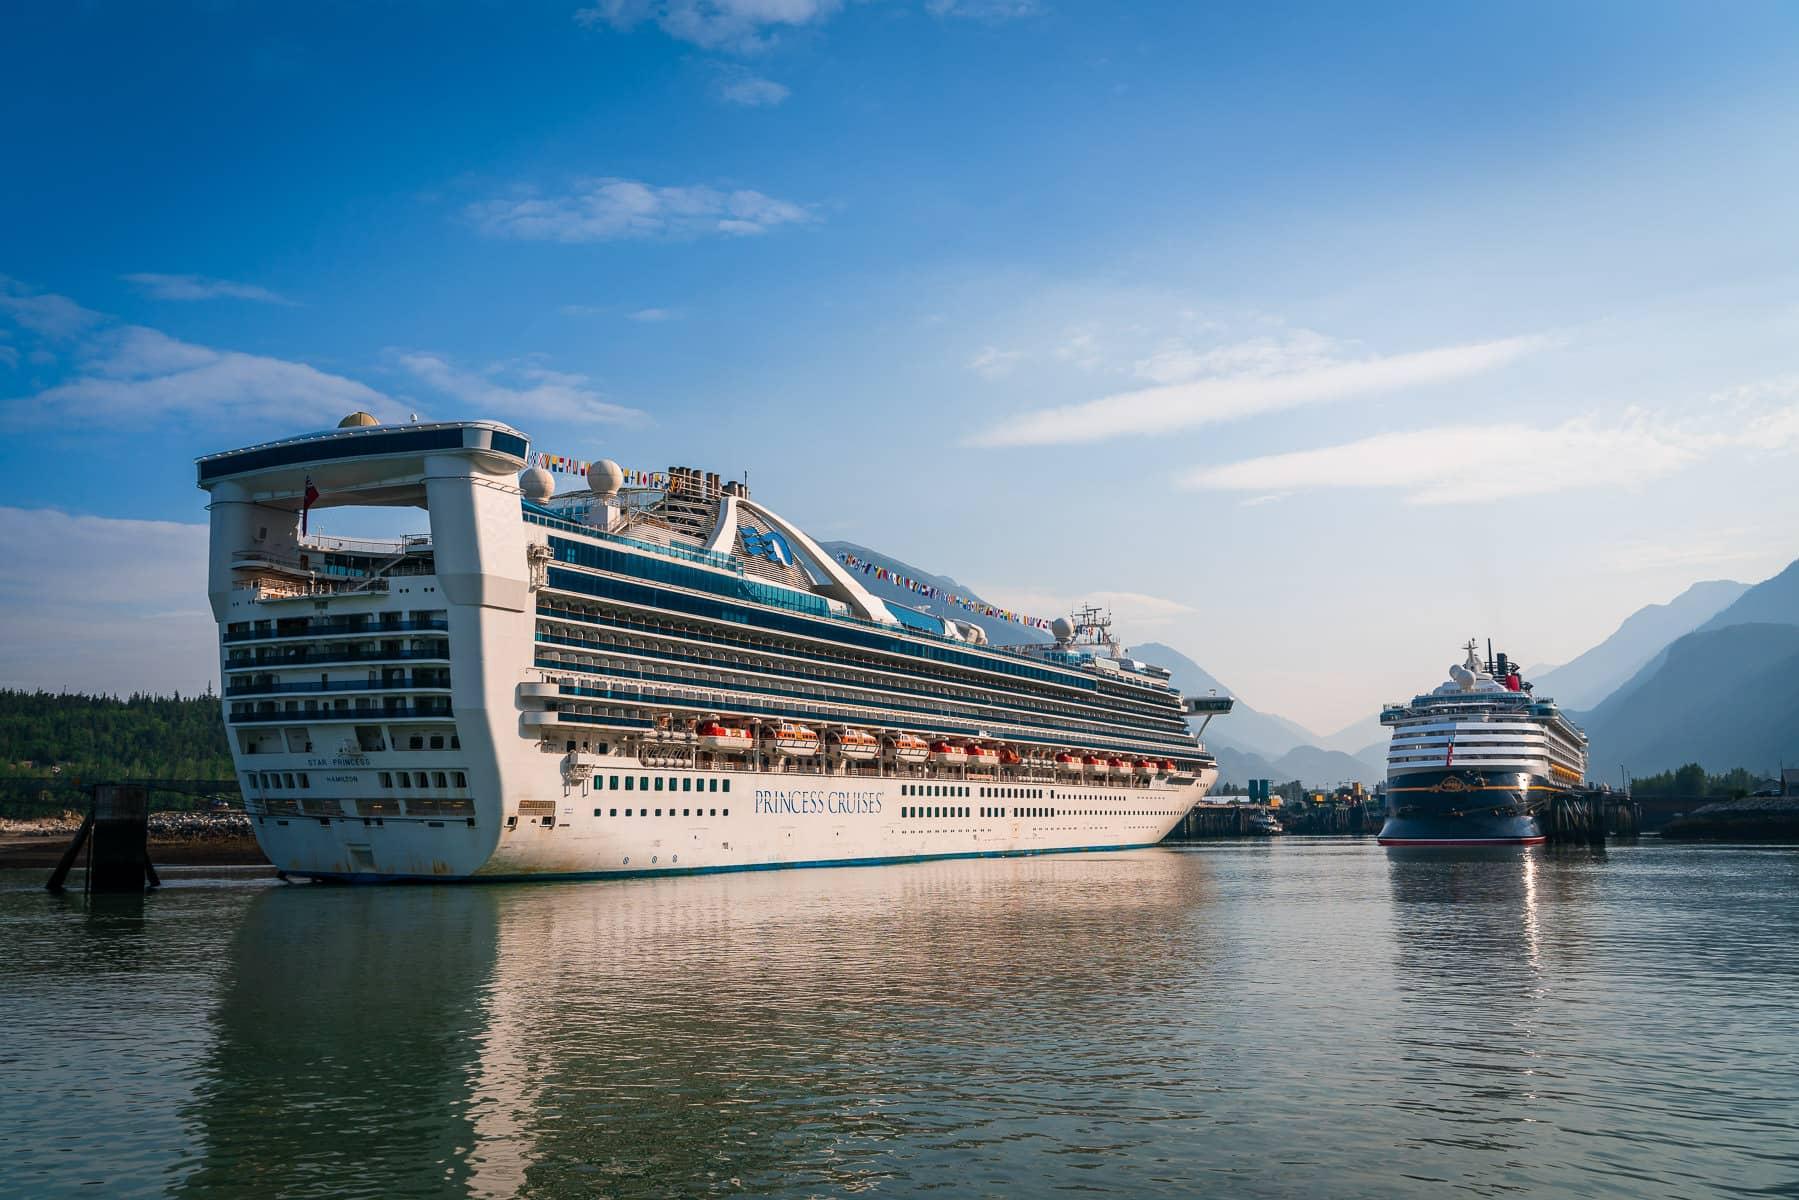 The cruise shipsStar PrincessandDisney Wonder, docked in Skagway, Alaska.